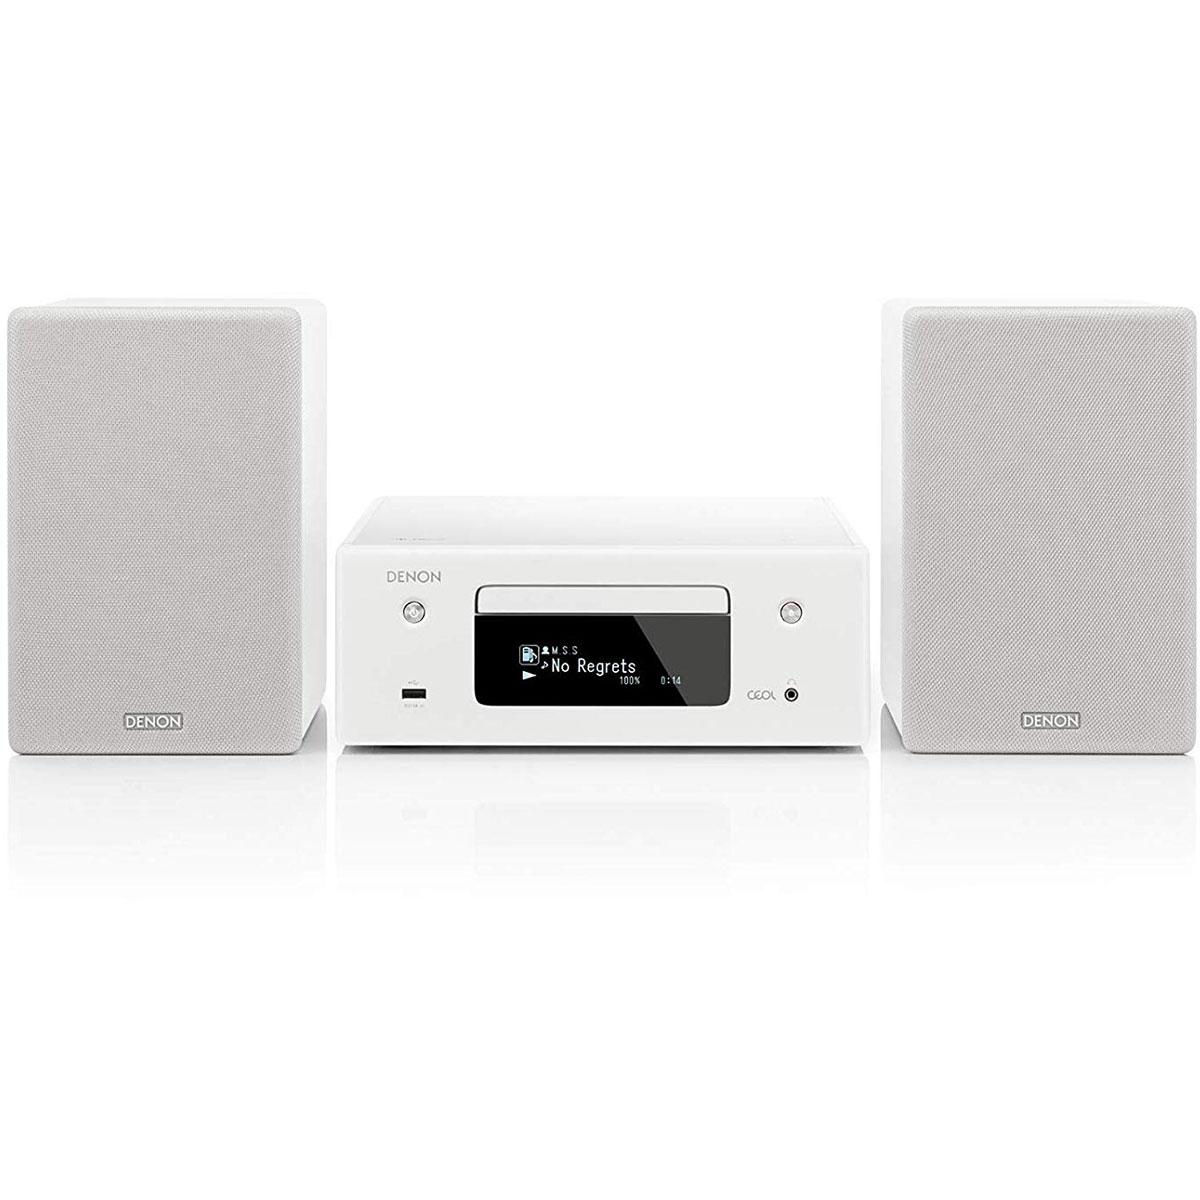 Chaîne Hifi Denon CEOL N10 Blanc Micro-chaîne CD MP3 USB réseau Wi-Fi Bluetooth avec contrôle iOS, Android et Amazon Alexa